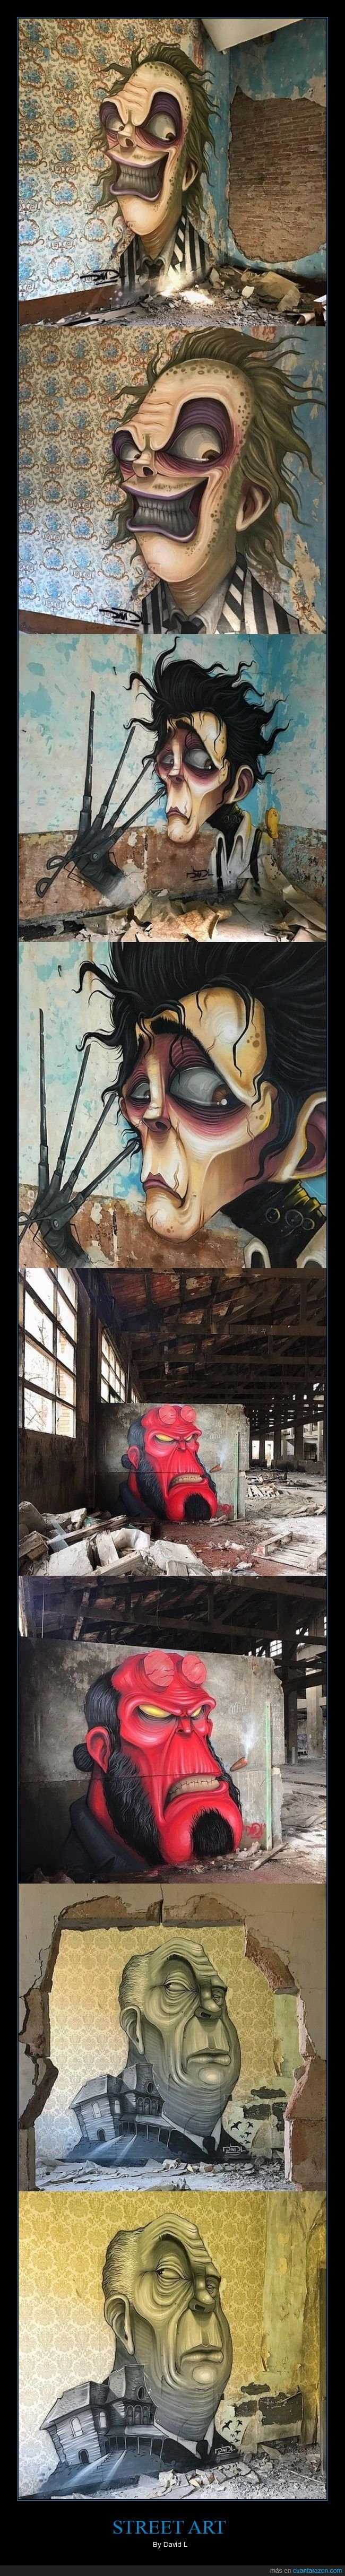 arte callejero,david l